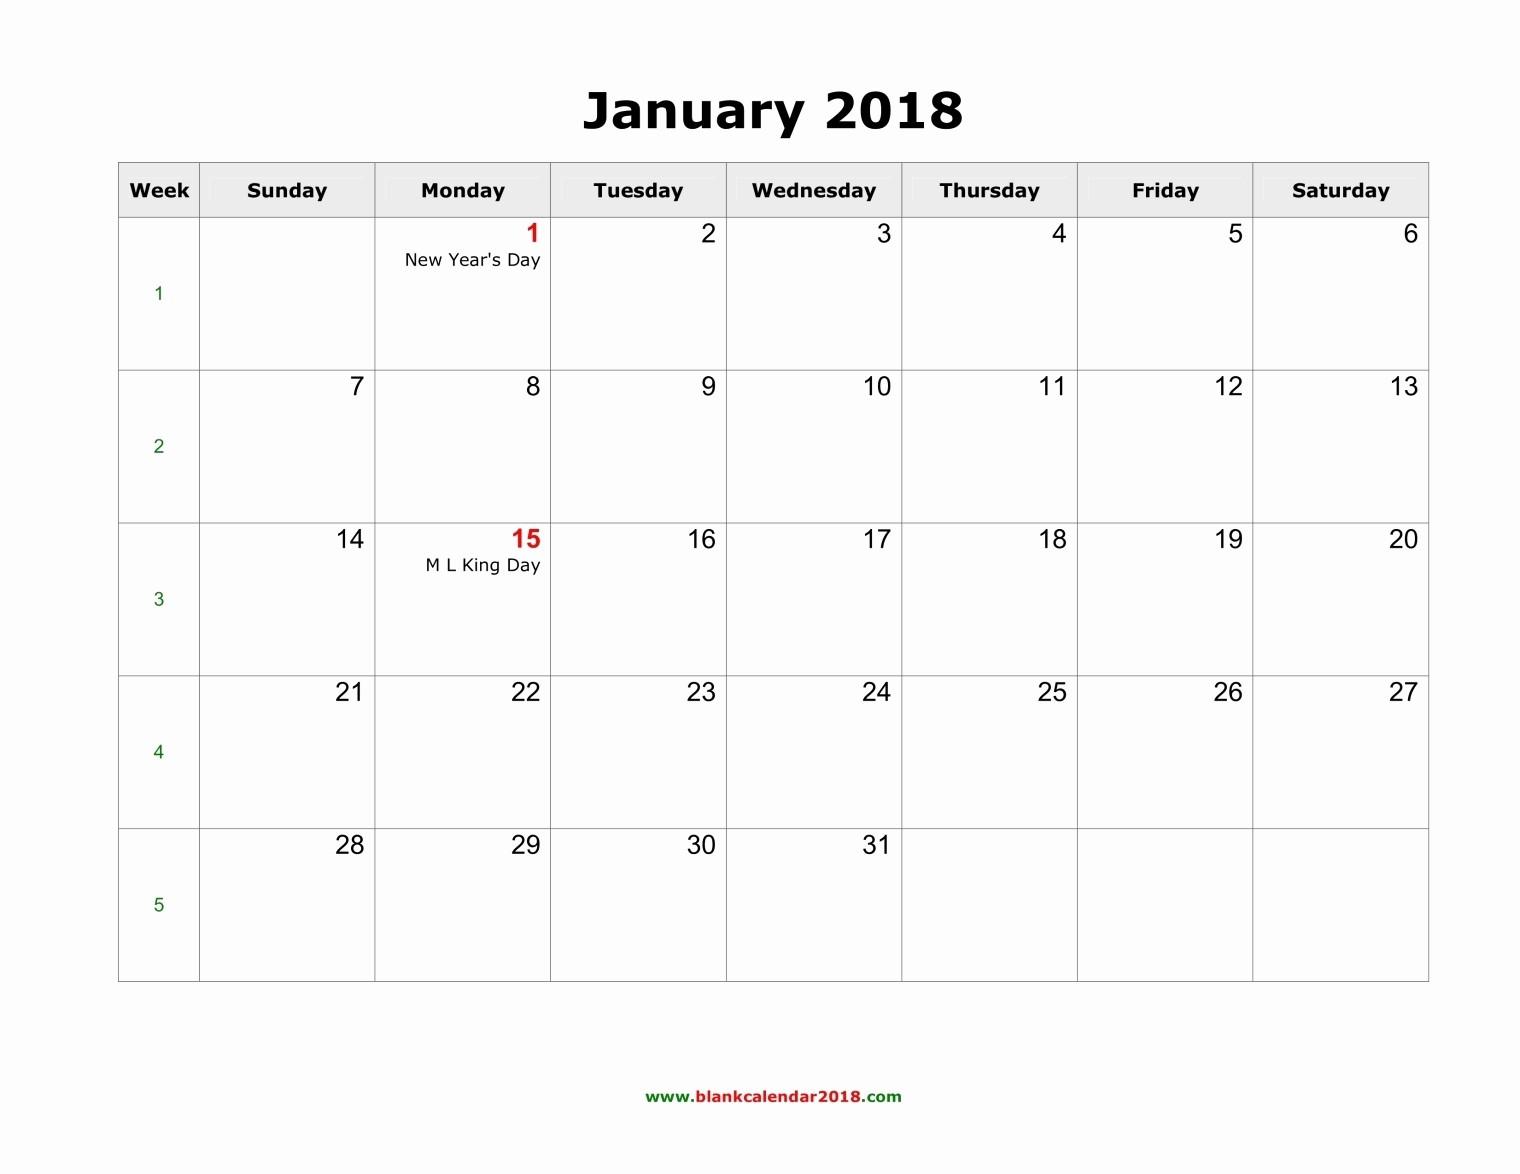 2018 Month by Month Calendar Inspirational Blank Monthly Calendar 2018